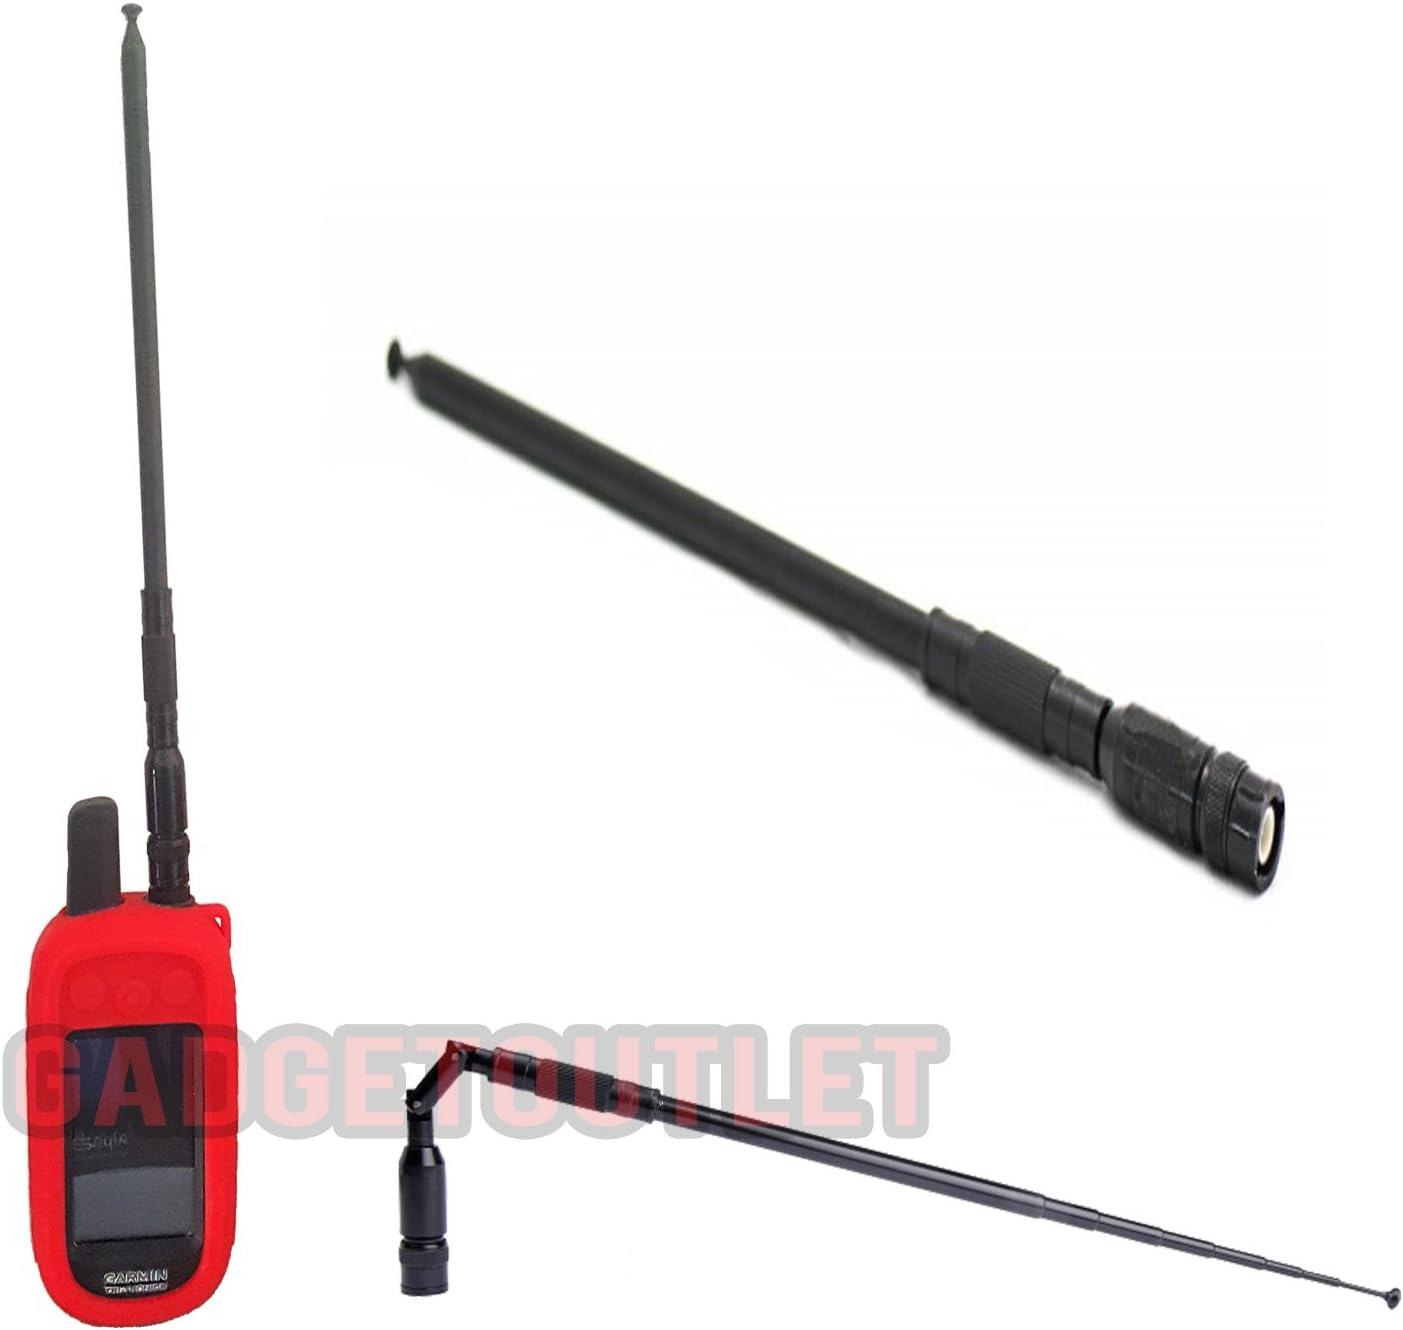 Super Long Range 123 cm plegable telesc/ópico Antena Negro compatible para Garmin Astro y alpha